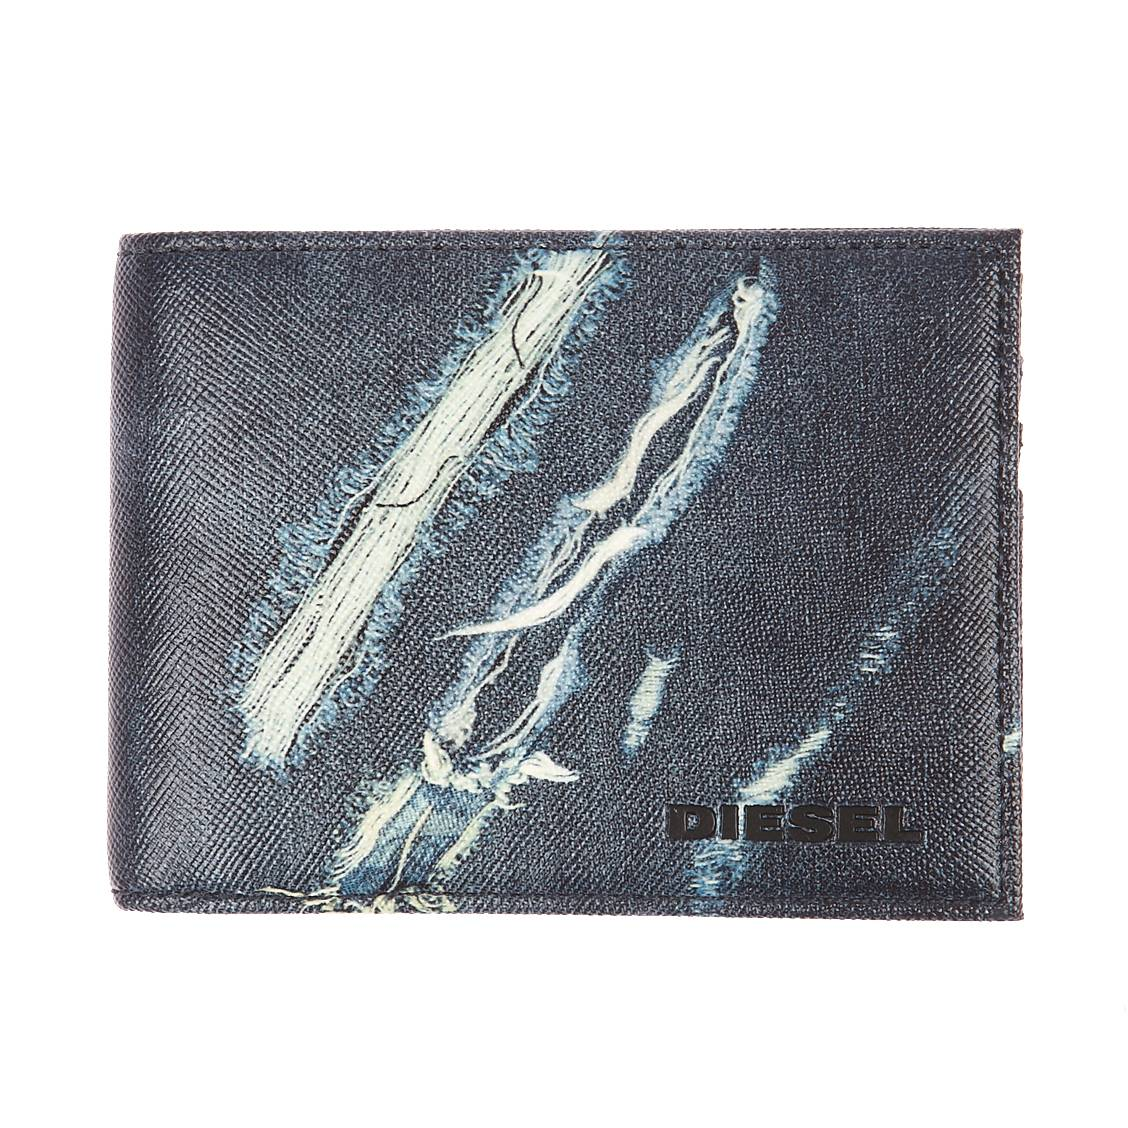 Portefeuille italien neela s  en cuir souple à motifs jean destroy